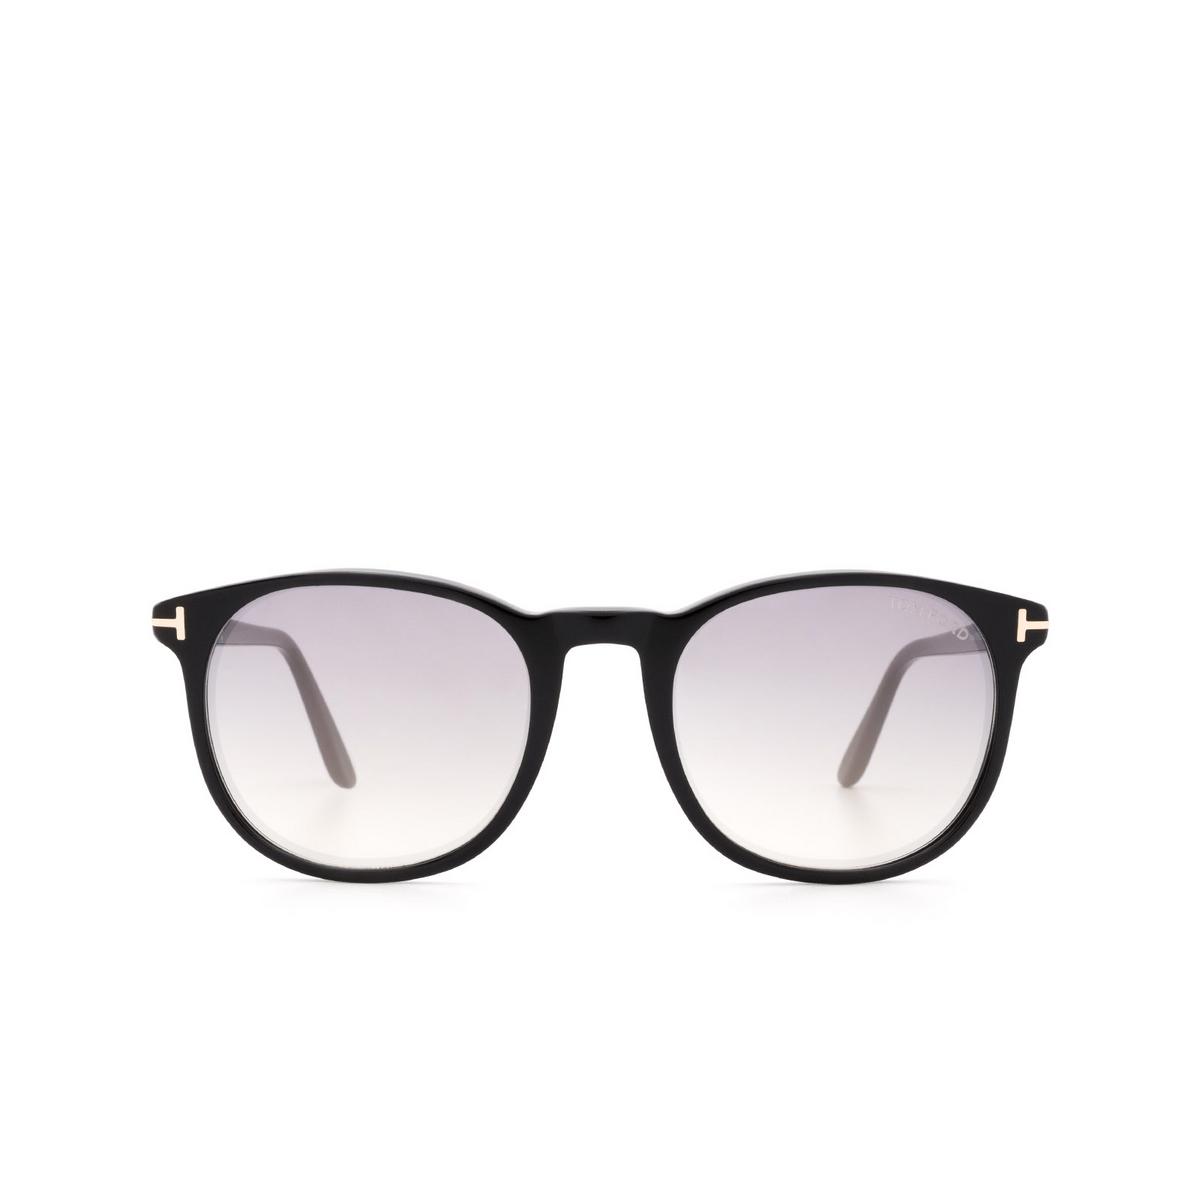 Tom Ford® Square Sunglasses: Ansel FT0858 color Black 01C.